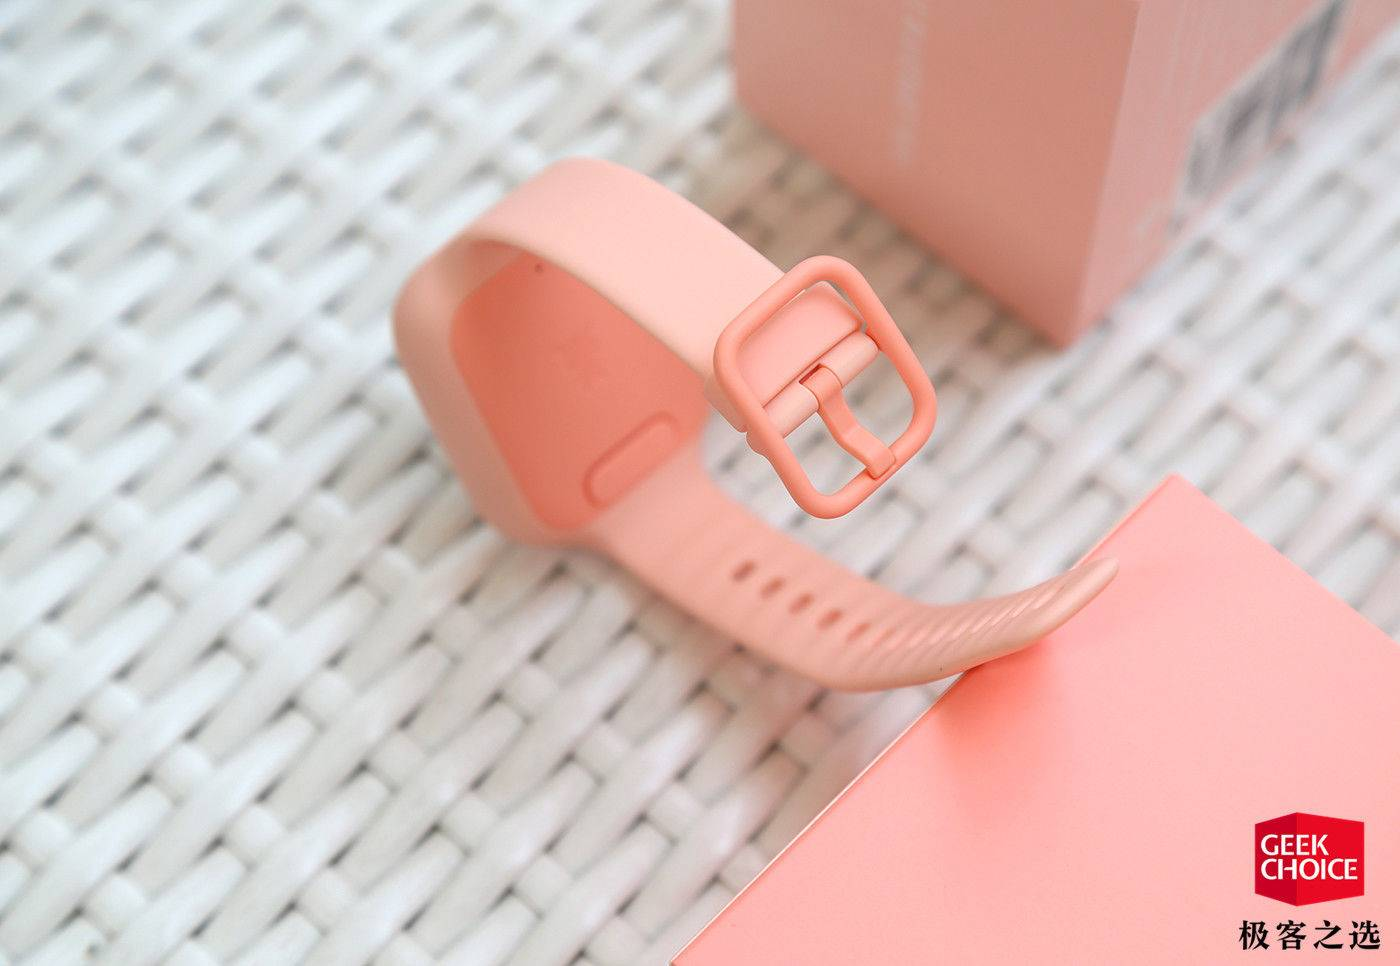 4G版米兔儿童电话手表3图赏:一款内置有小爱同学的儿童手表